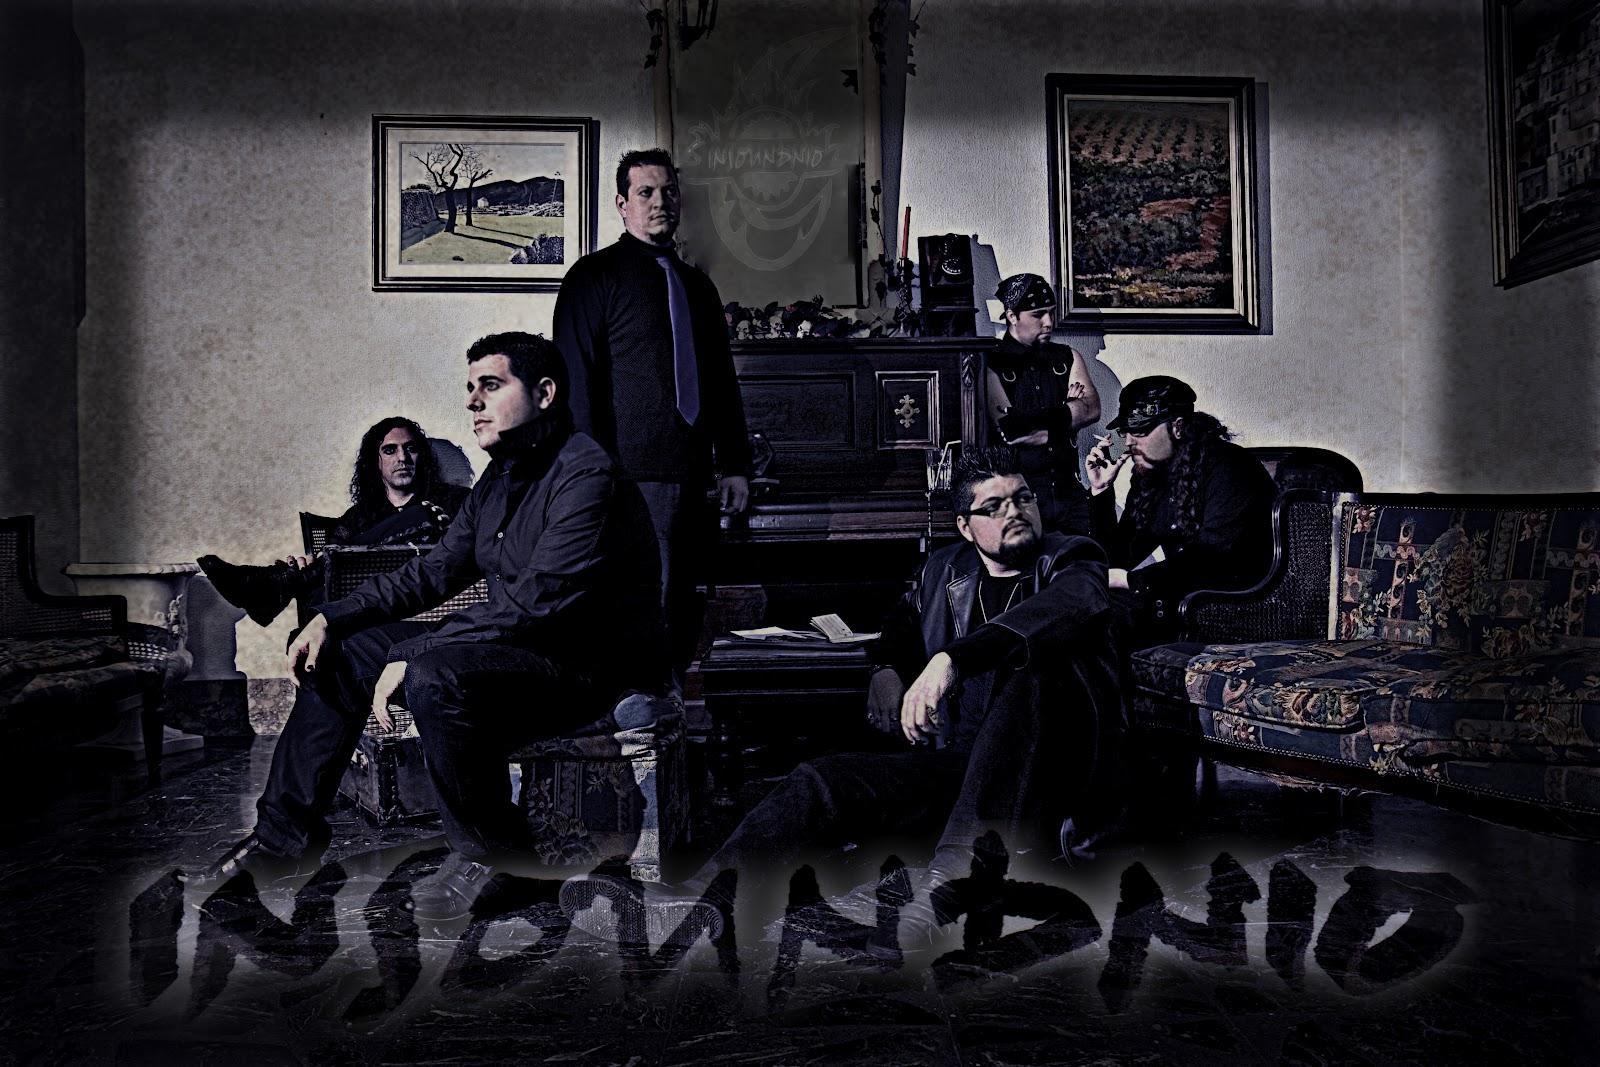 Insoundnio Promocion 2012